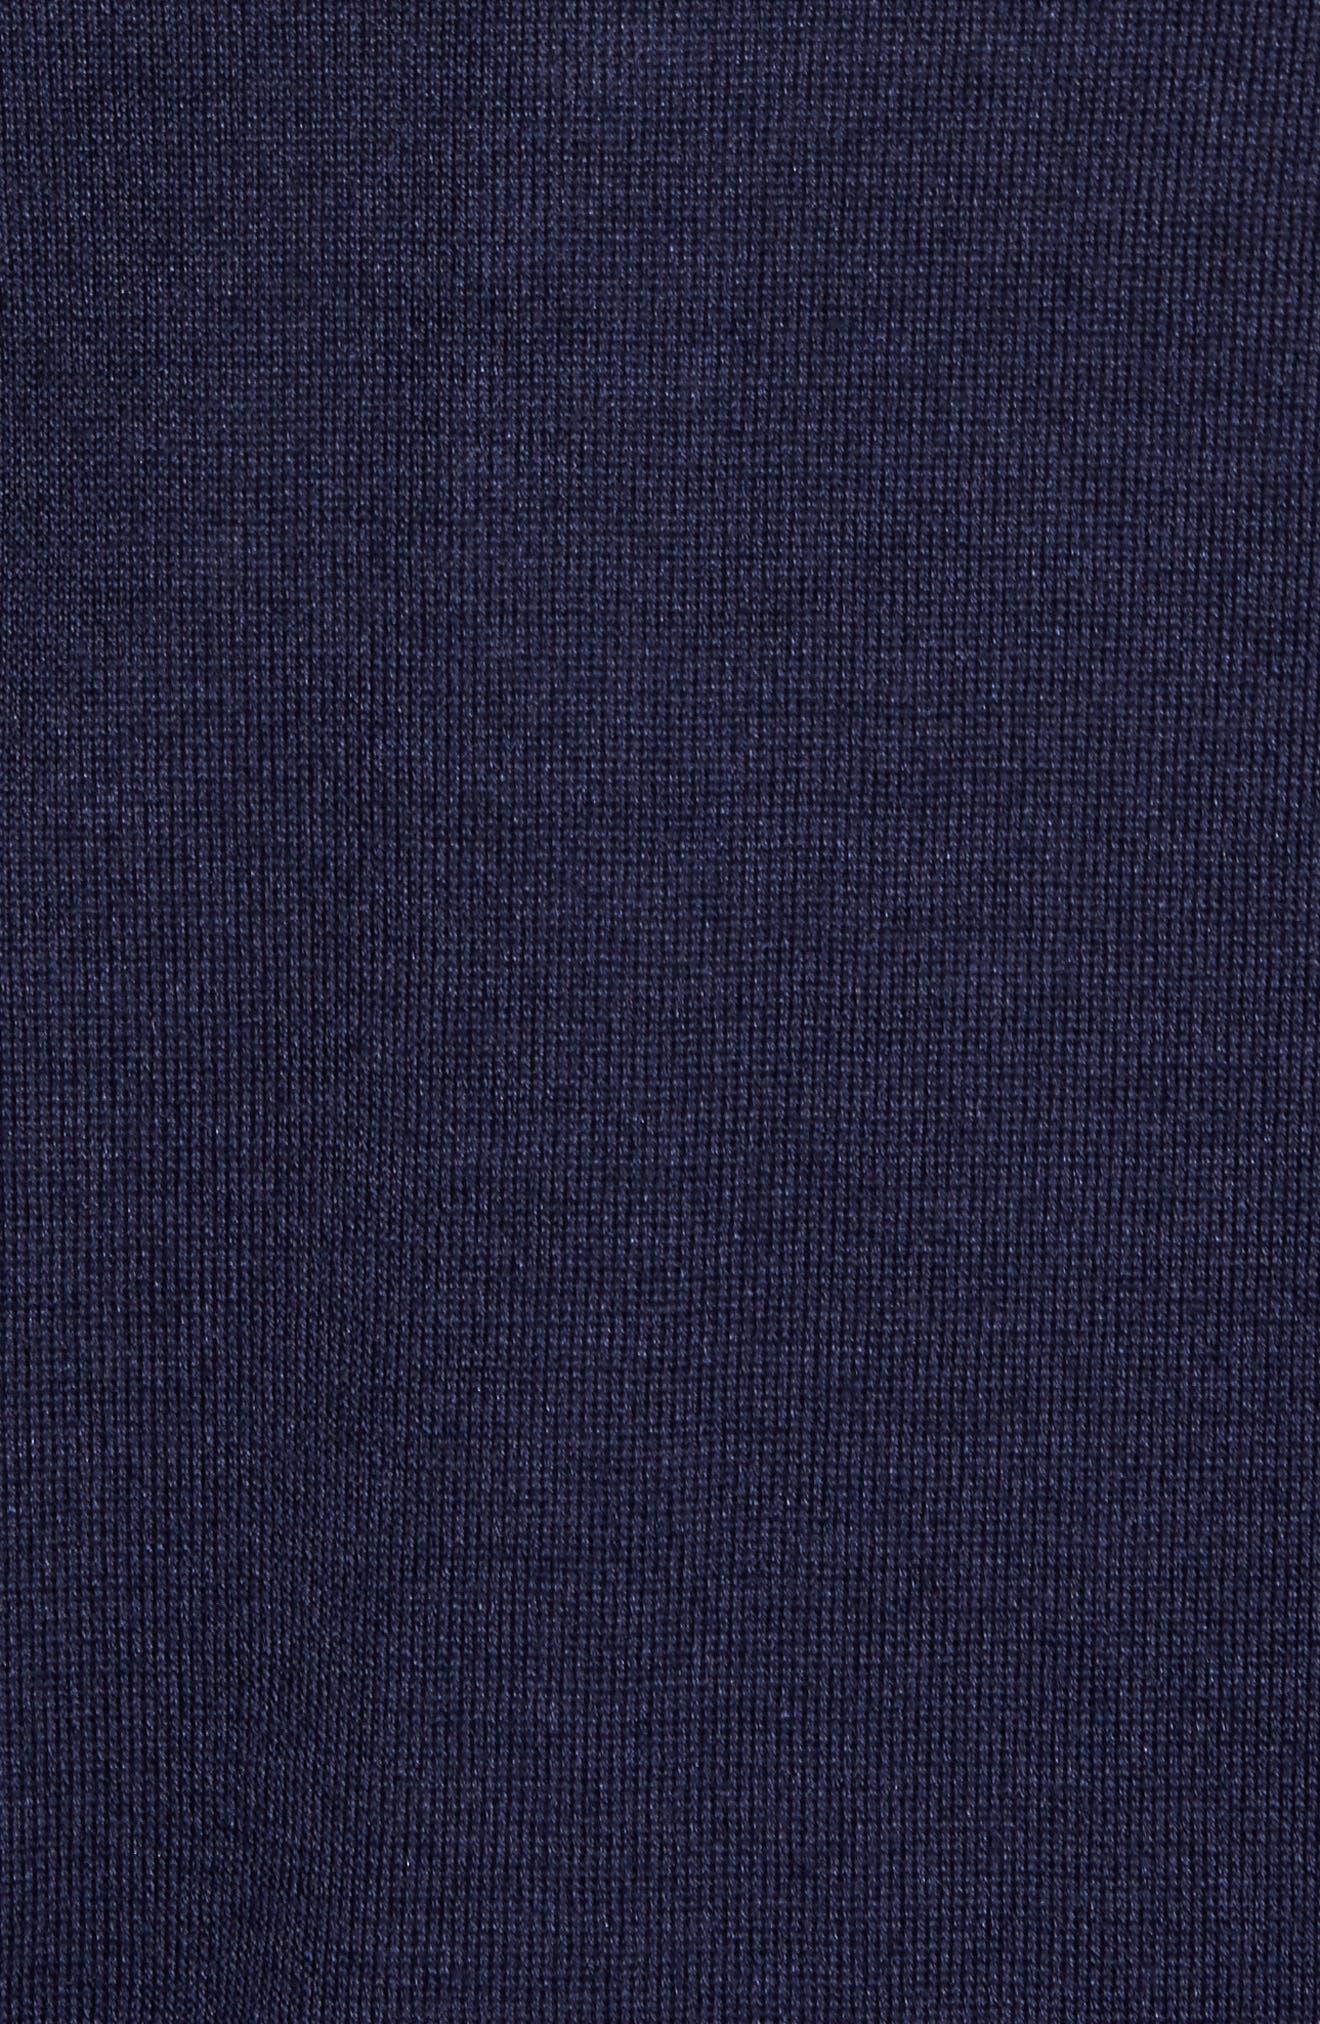 Wool Blend Quarter Zip Sweater,                             Alternate thumbnail 10, color,